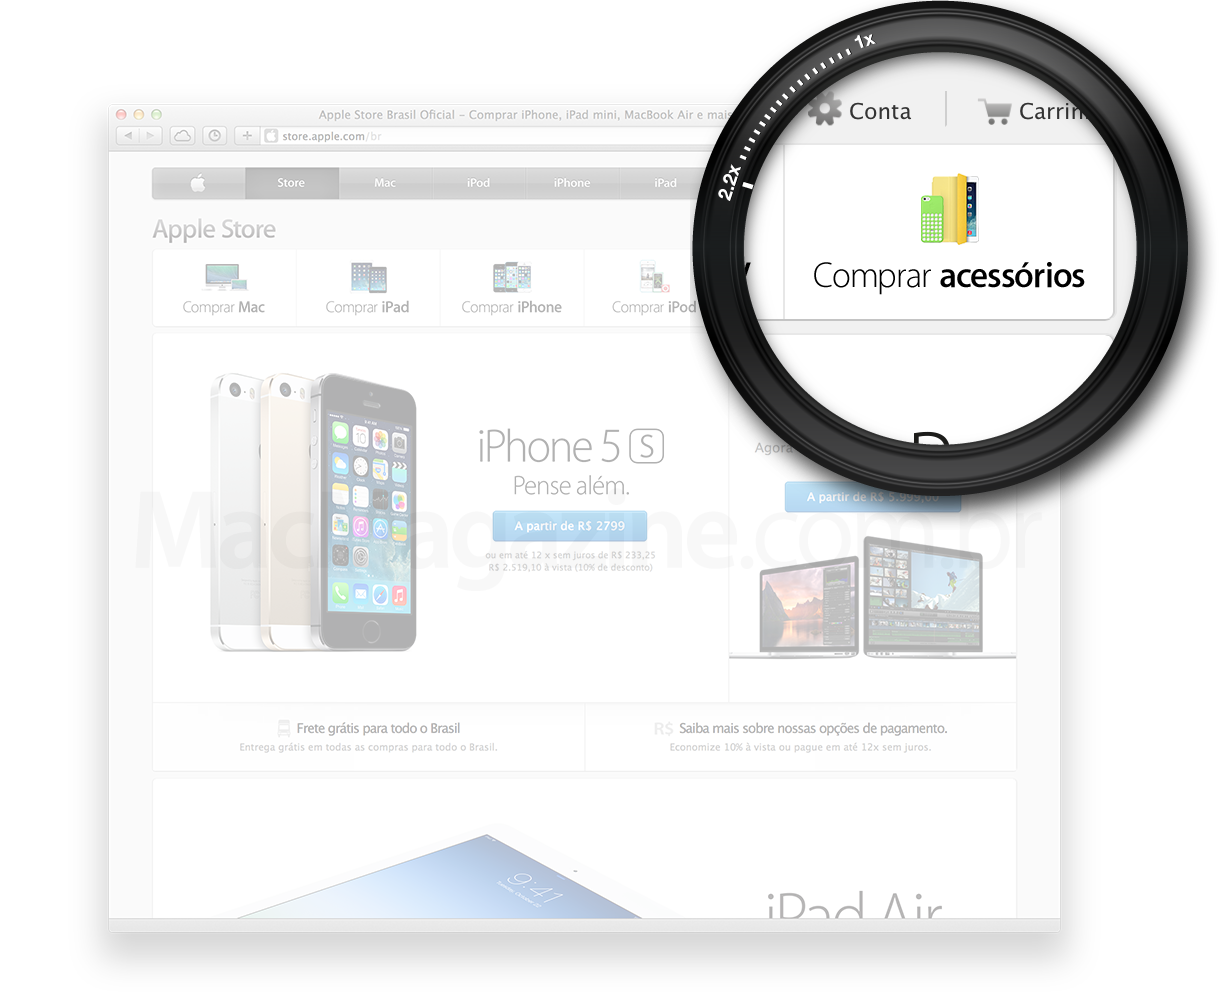 Comprar acessórios na Apple Online Store